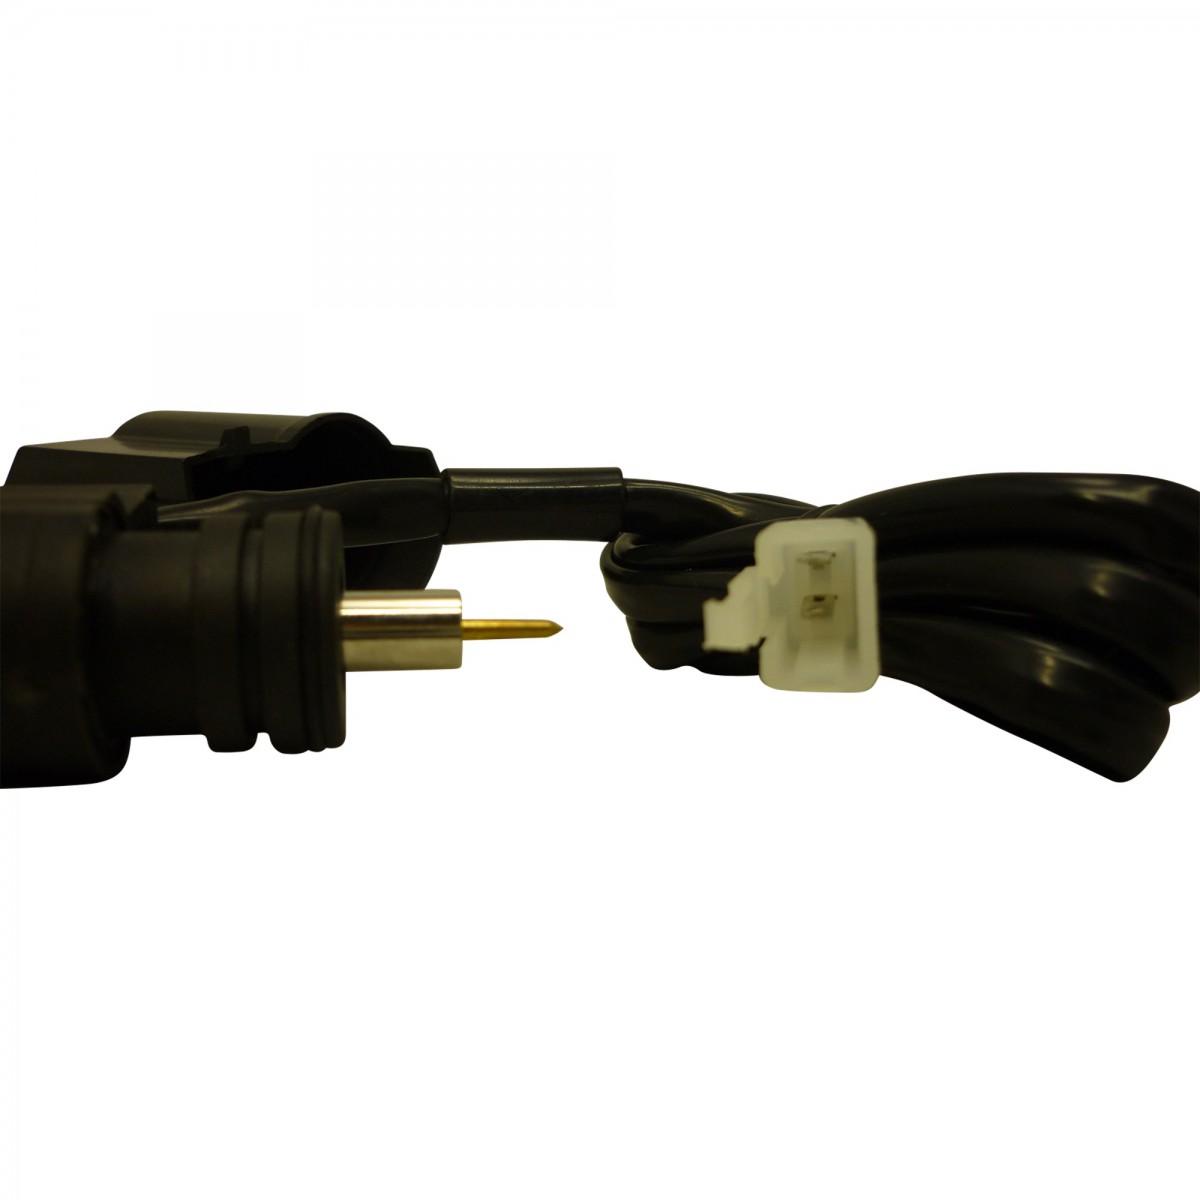 kaltstartautomatik incl kabel stecker und abdeckung. Black Bedroom Furniture Sets. Home Design Ideas